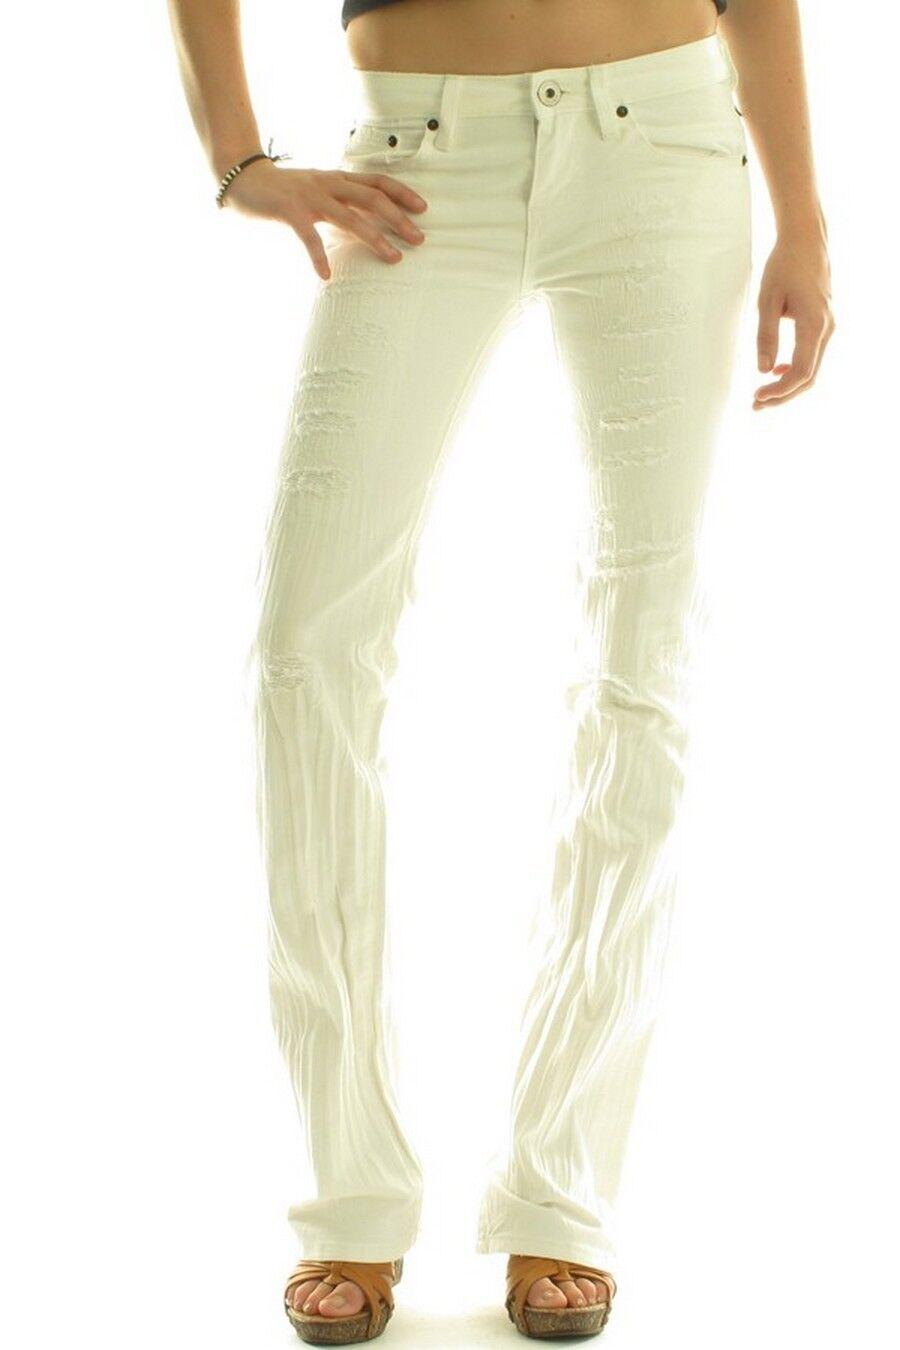 CHRISTIAN AUDIGIER Venice Luxury Designer Woherren Stiefelcut Jeans